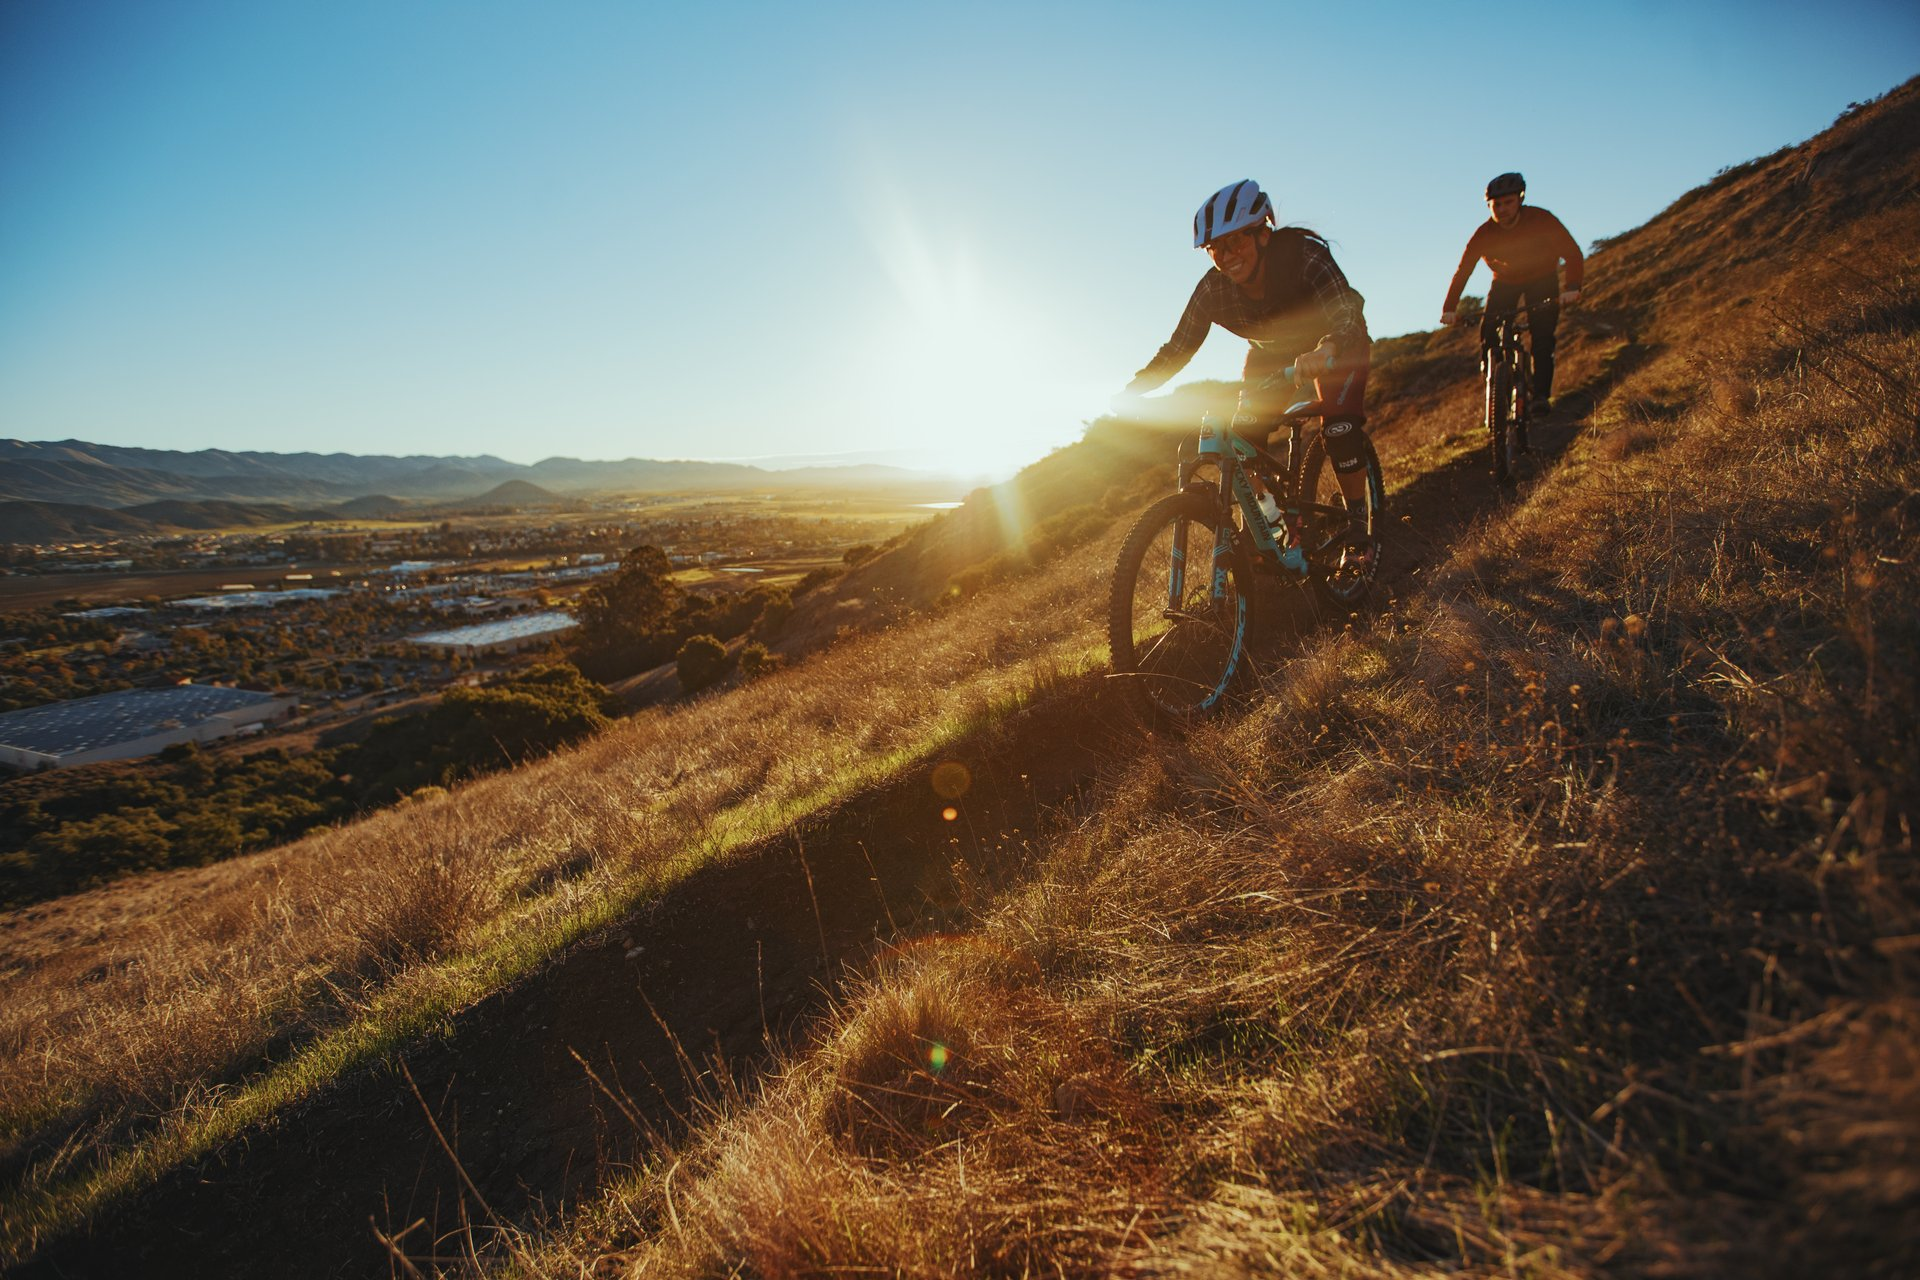 Cyclists coast down a steep trail.